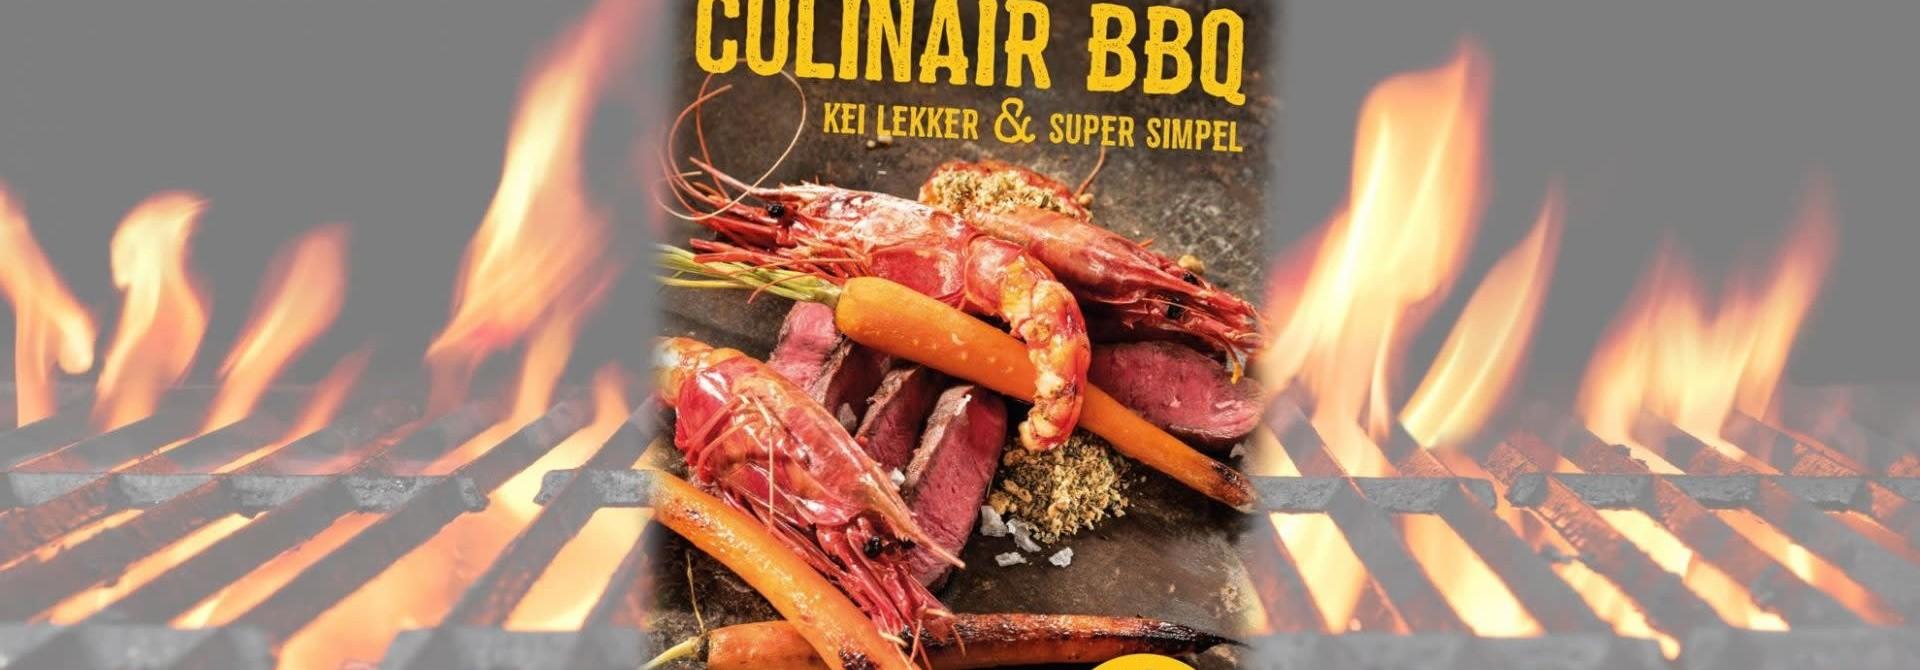 Culinair BBQ Keilekker & Supersimpel